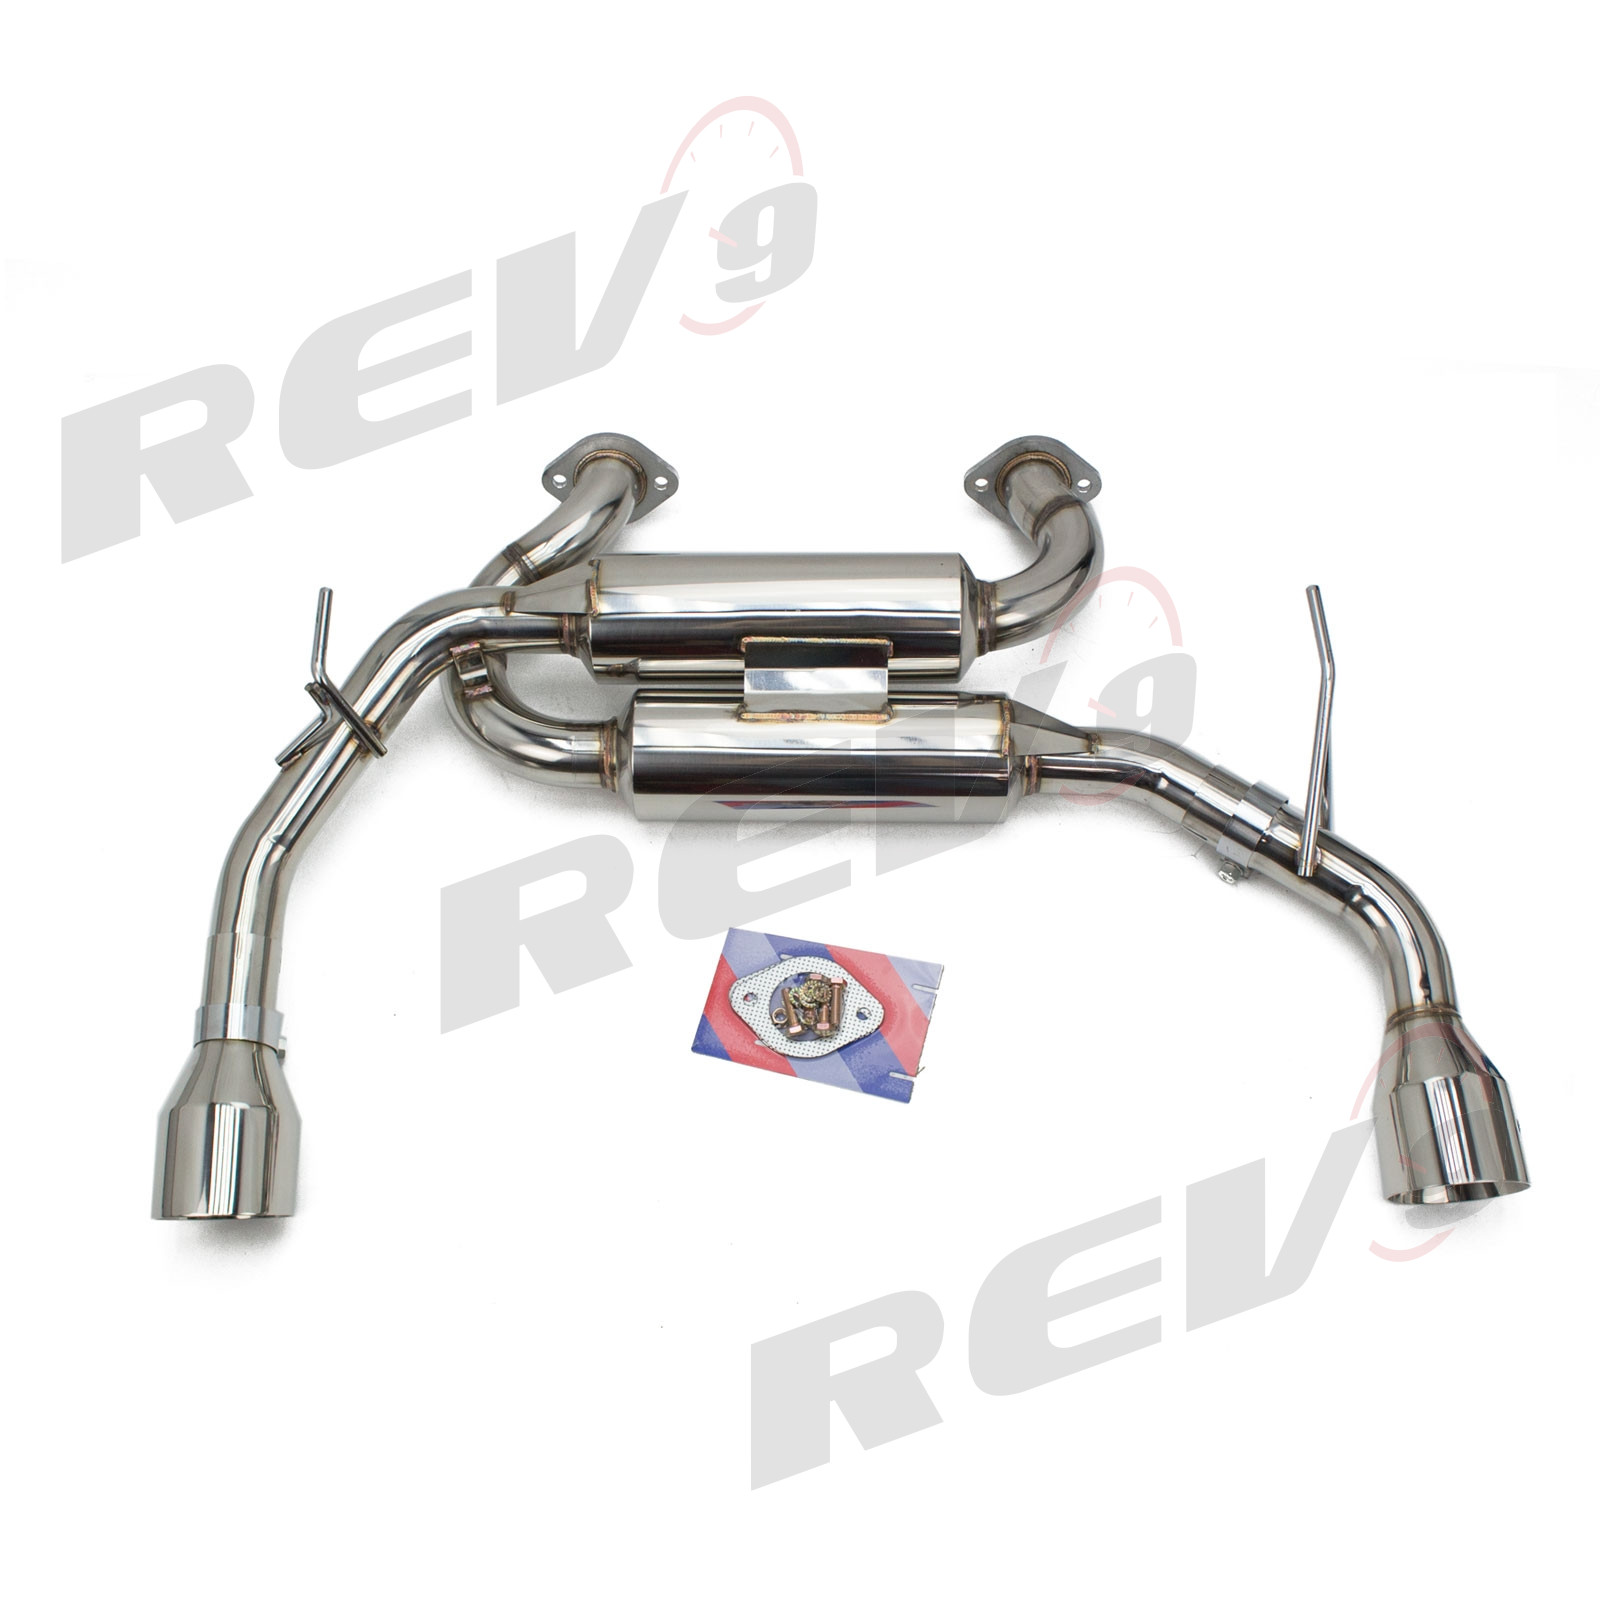 Rev9power Infiniti Q50 19 Flowmaxx Stainless Axle